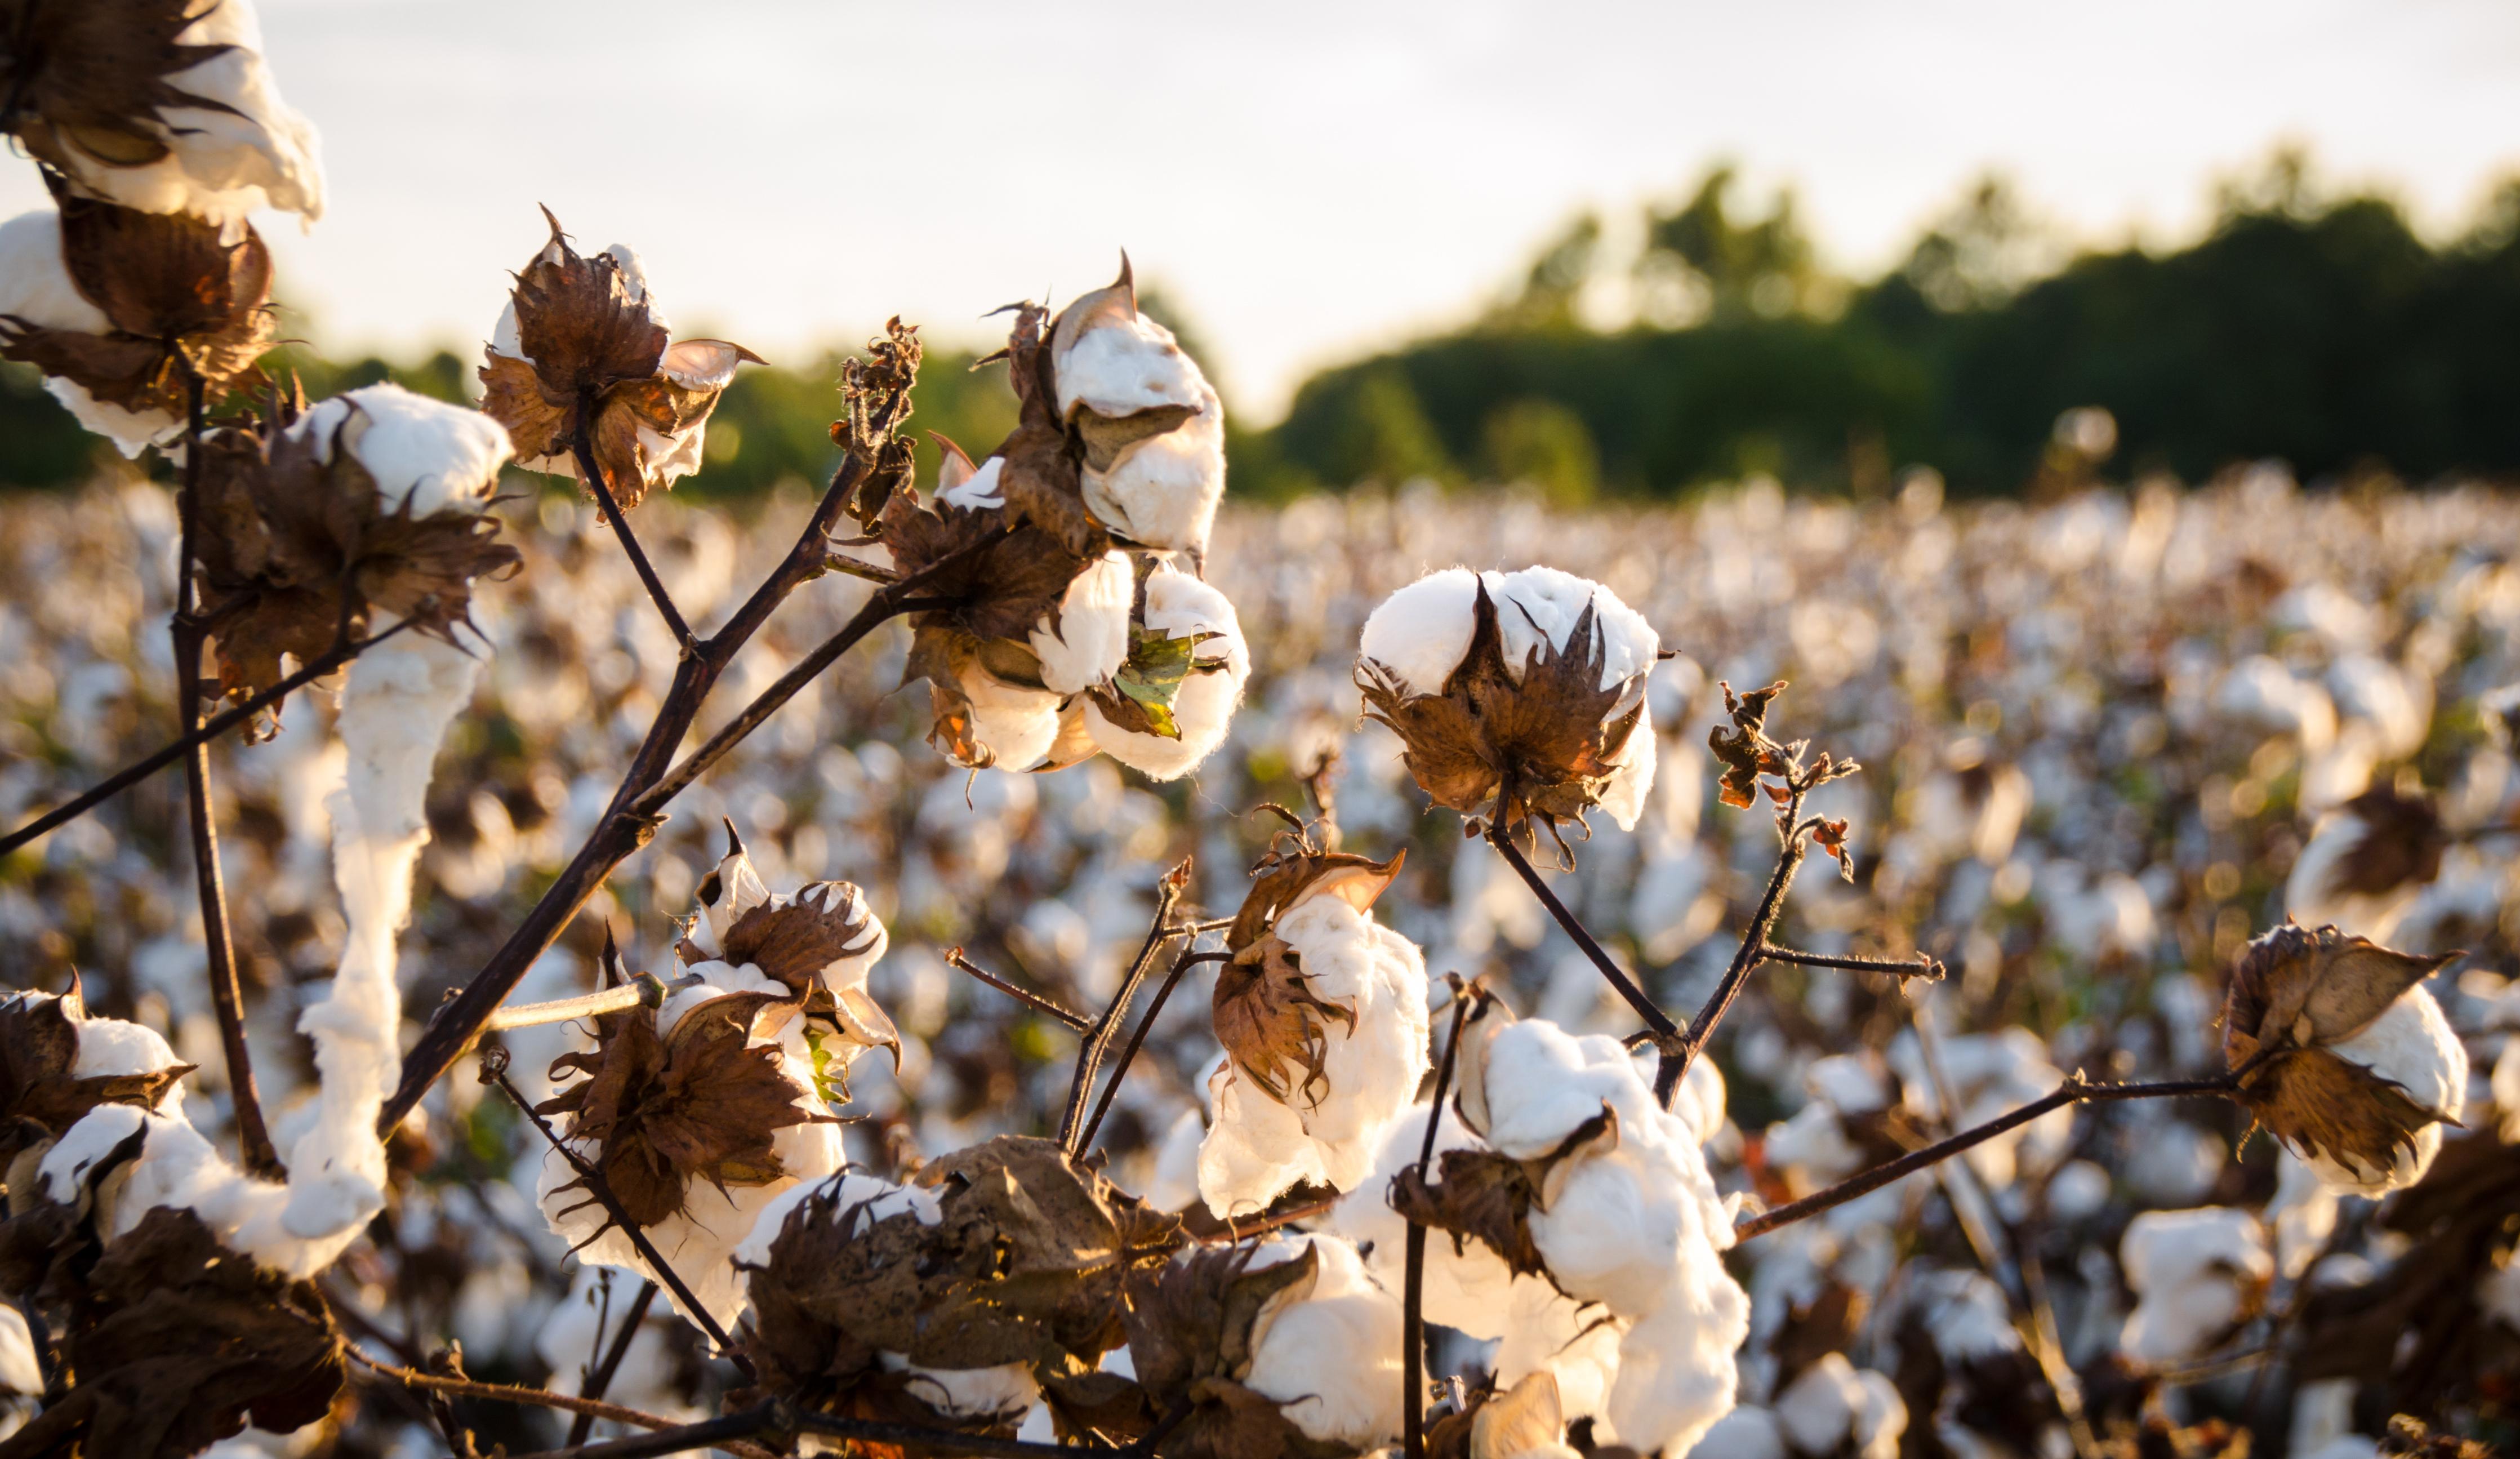 iStock-620997696 - cotton